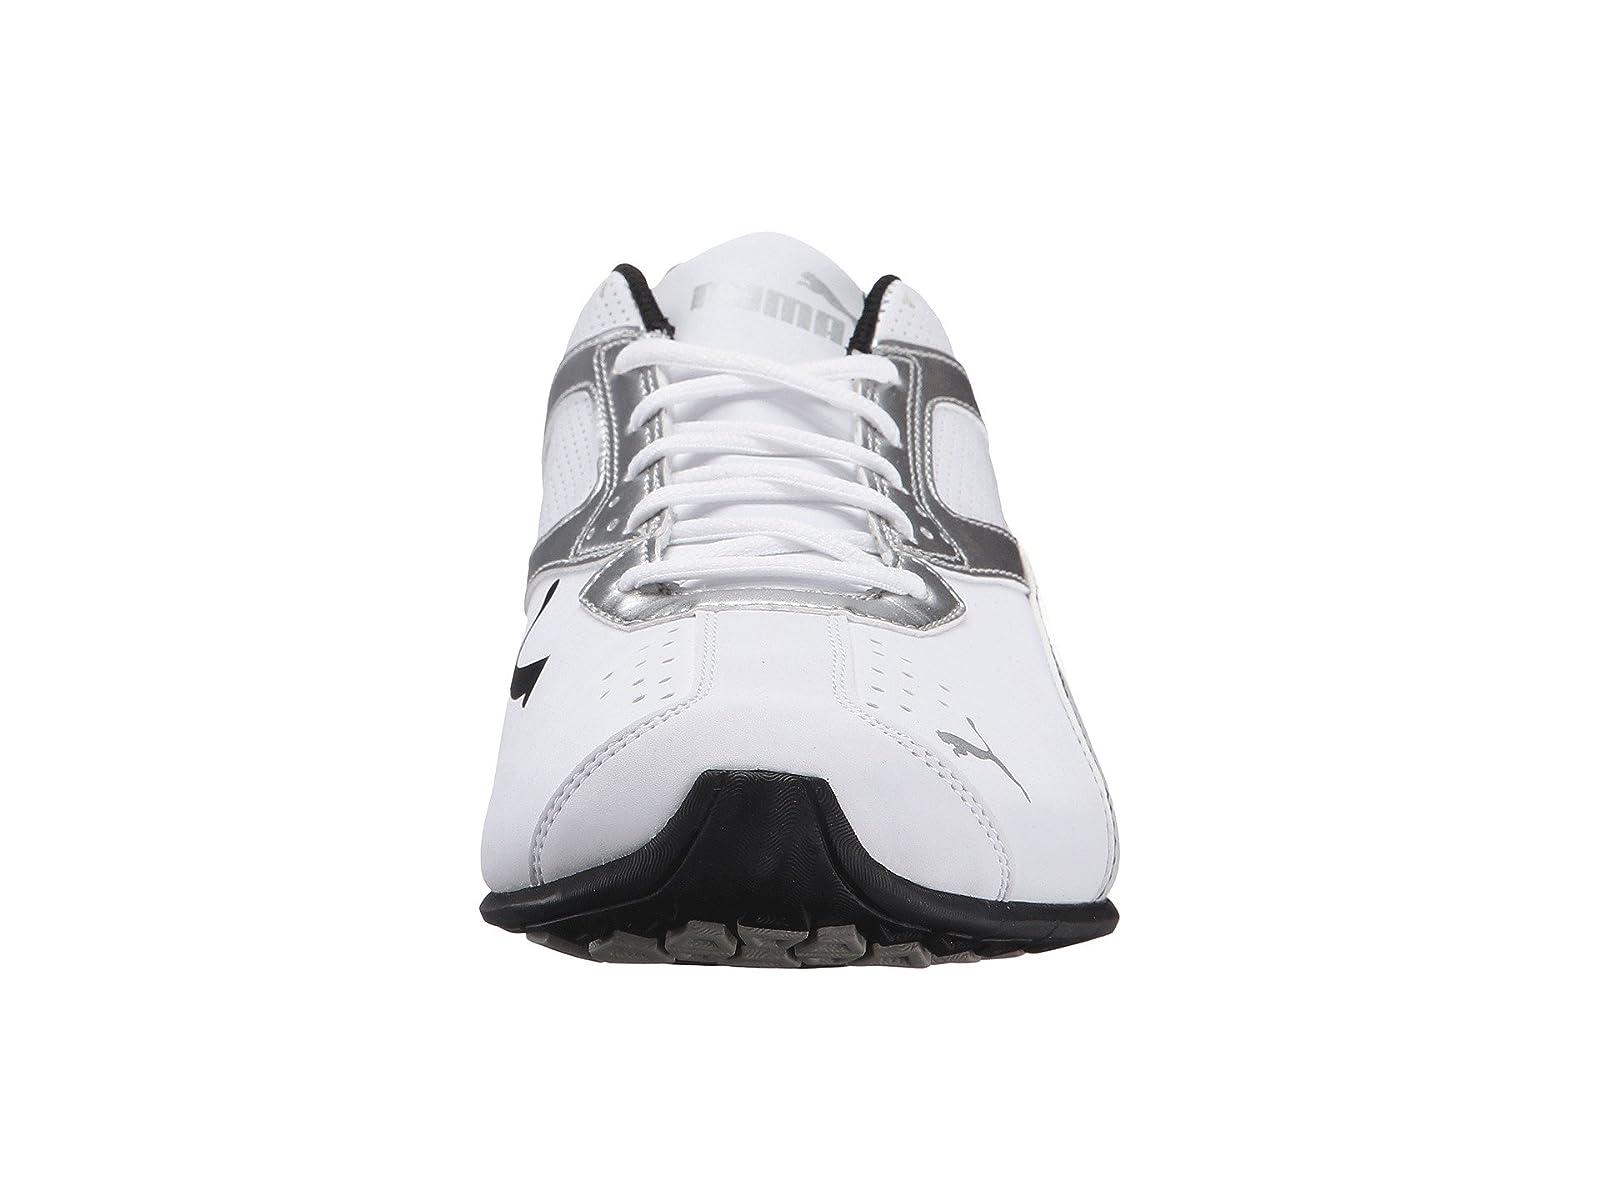 Men-039-s-Scarpe-Da-Ginnastica-amp-Athletic-Shoes-Puma-Tazon-6-FM miniatura 29